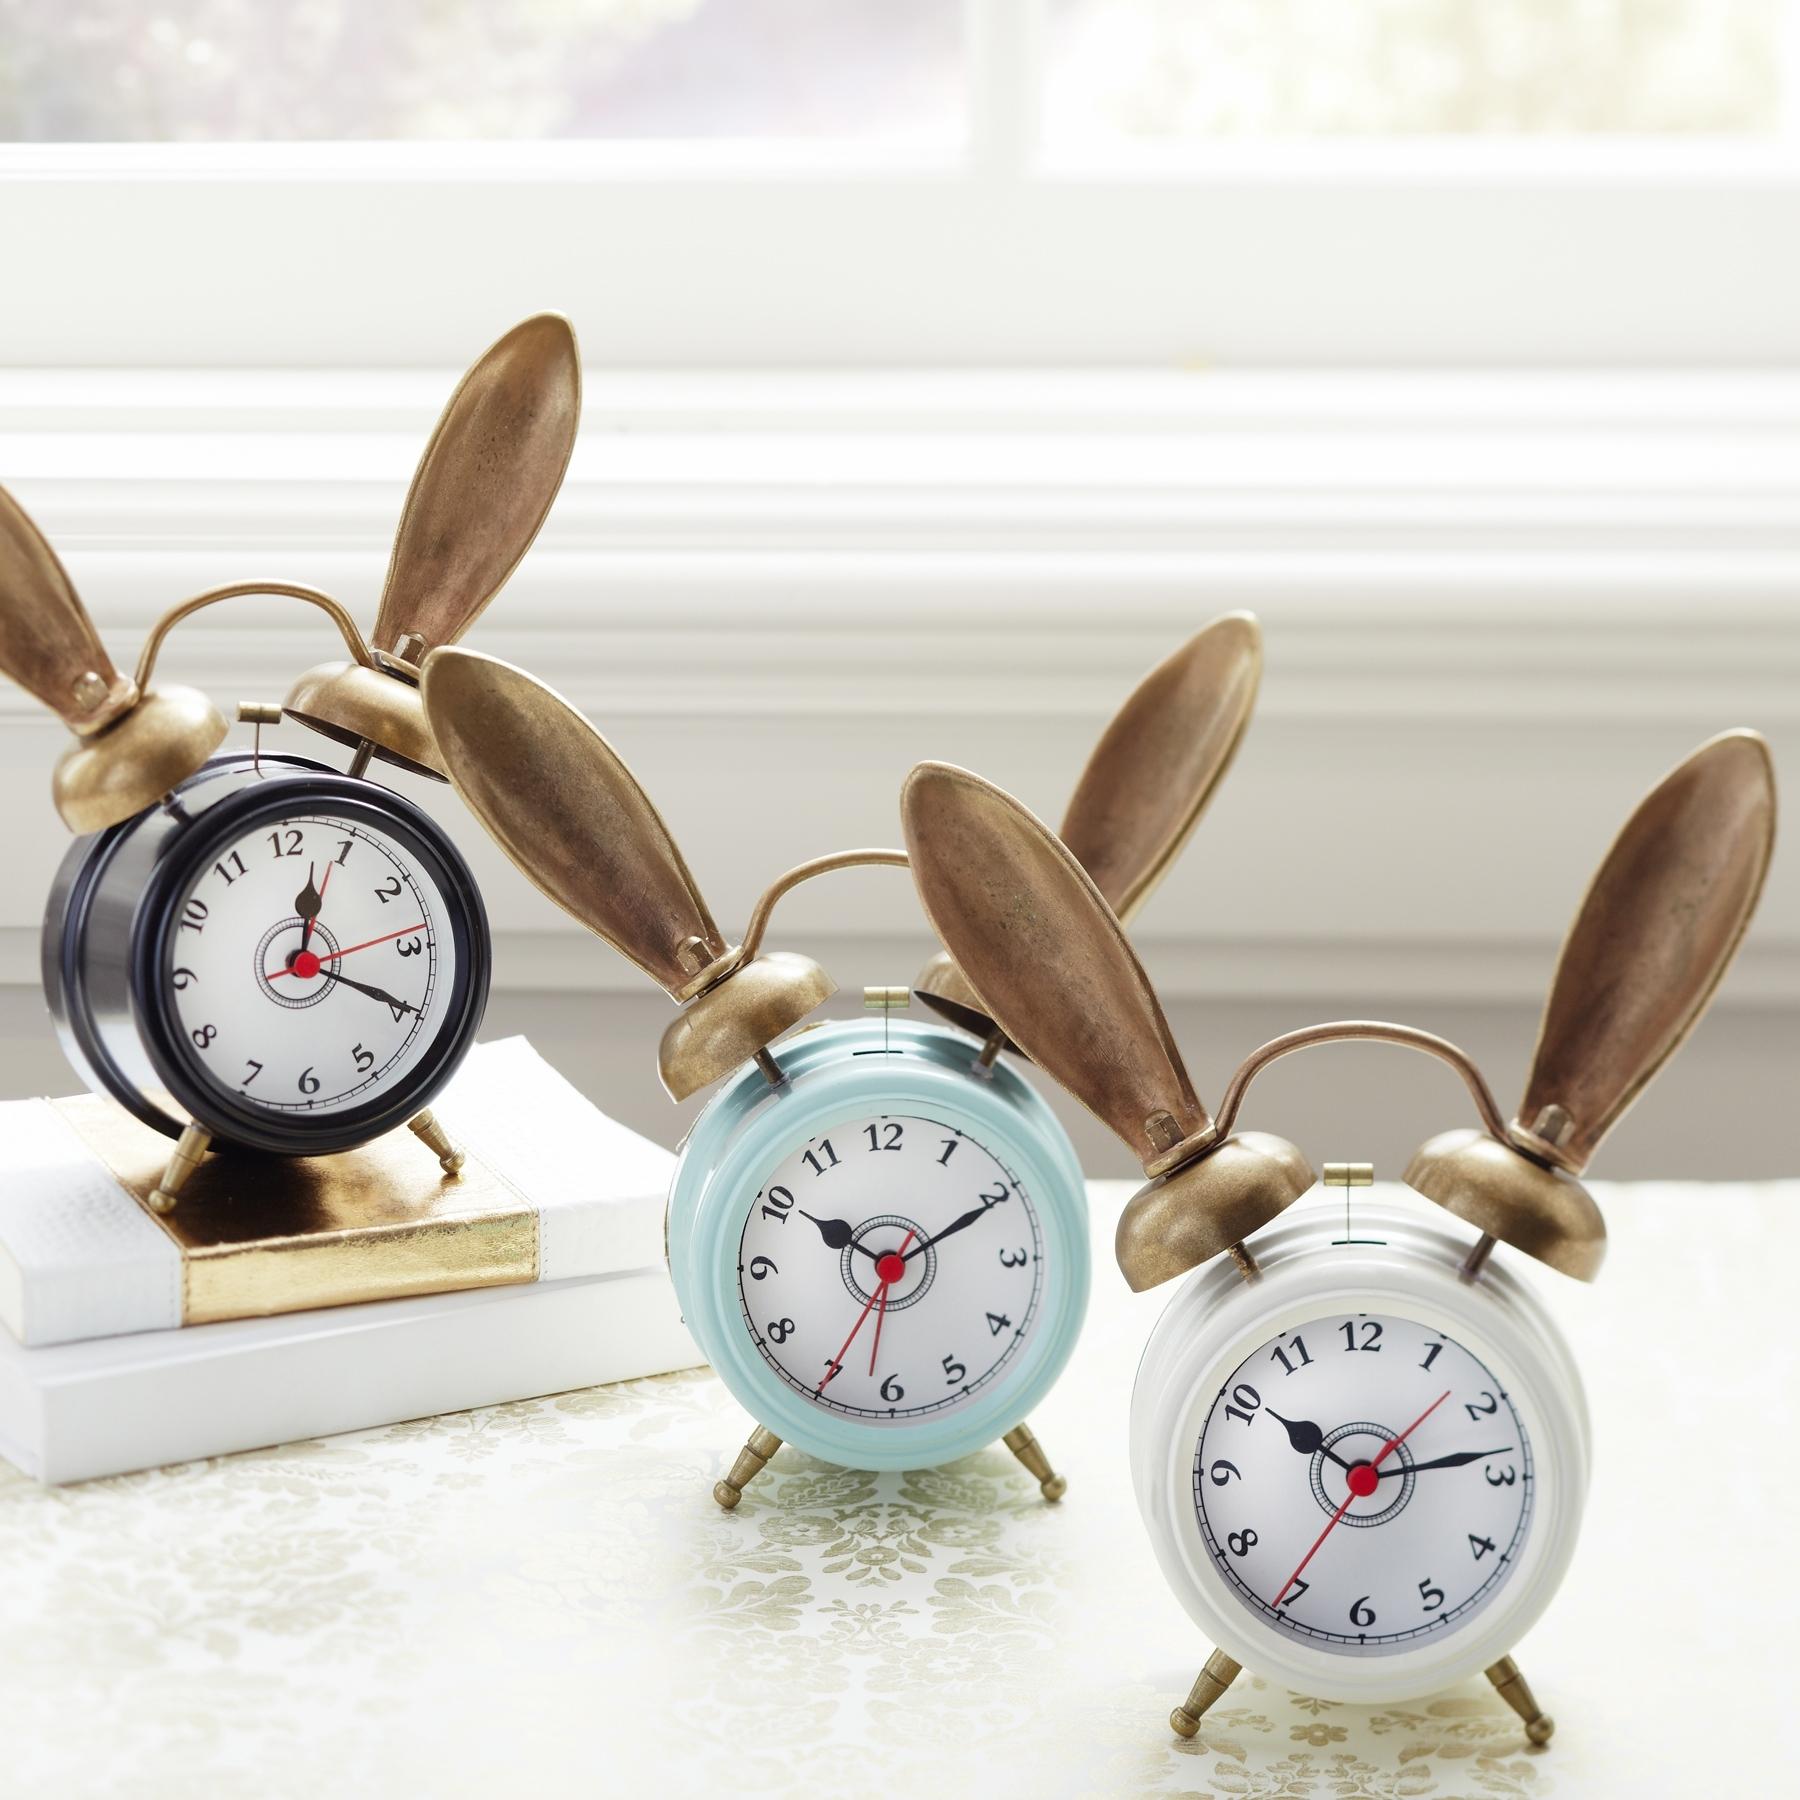 Emily & Meritt for PBteen- The Bunny Alarm Clock (Photo: Business Wire)